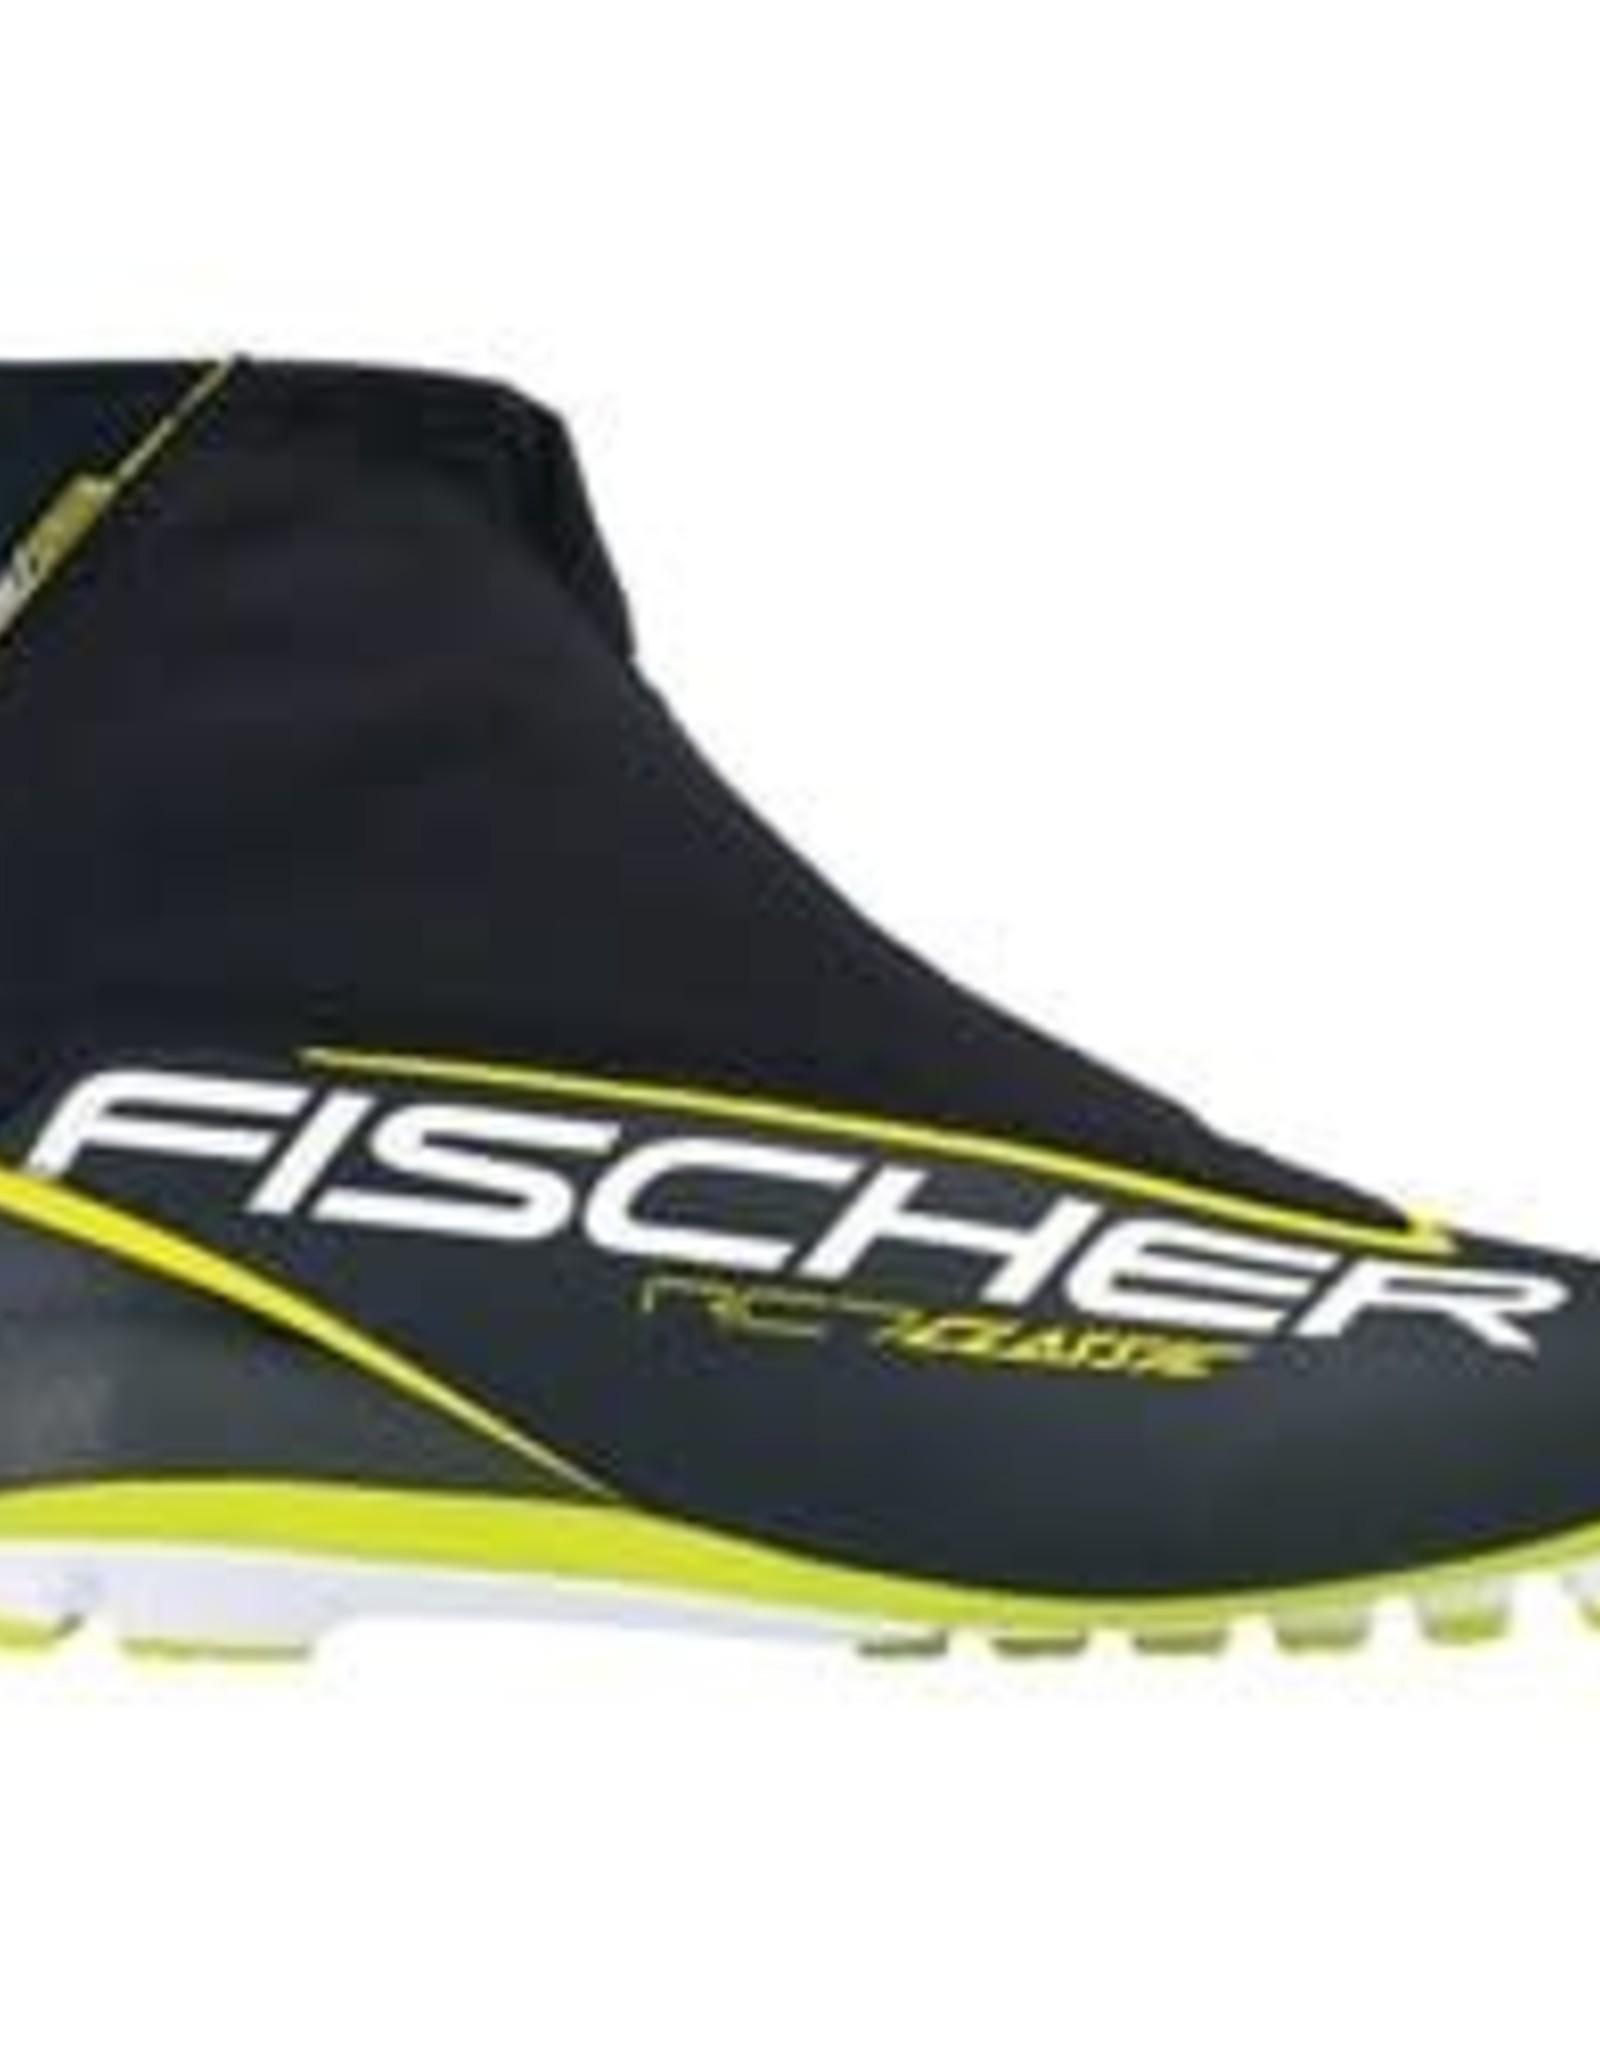 FISCHER FISCHER RC7 CLASSIC 44